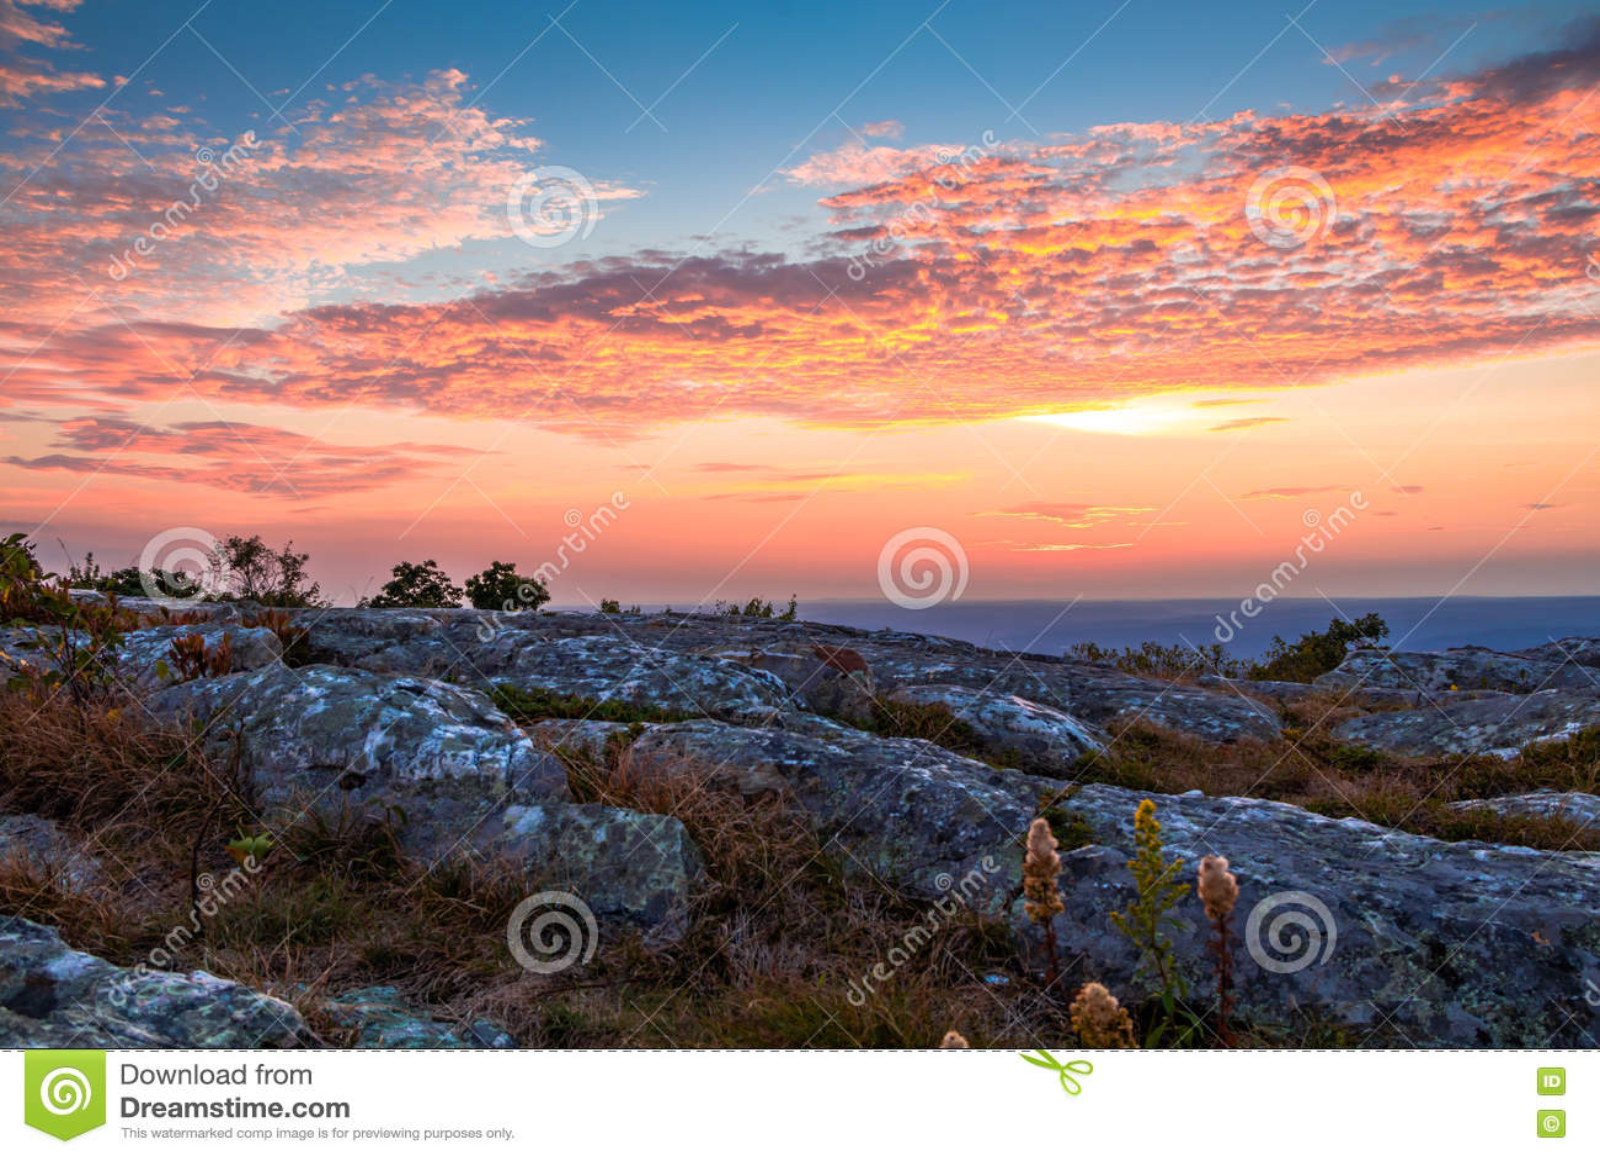 Felsige Granit Outcroppings erscheinen an der Spitze des Höhepunkts